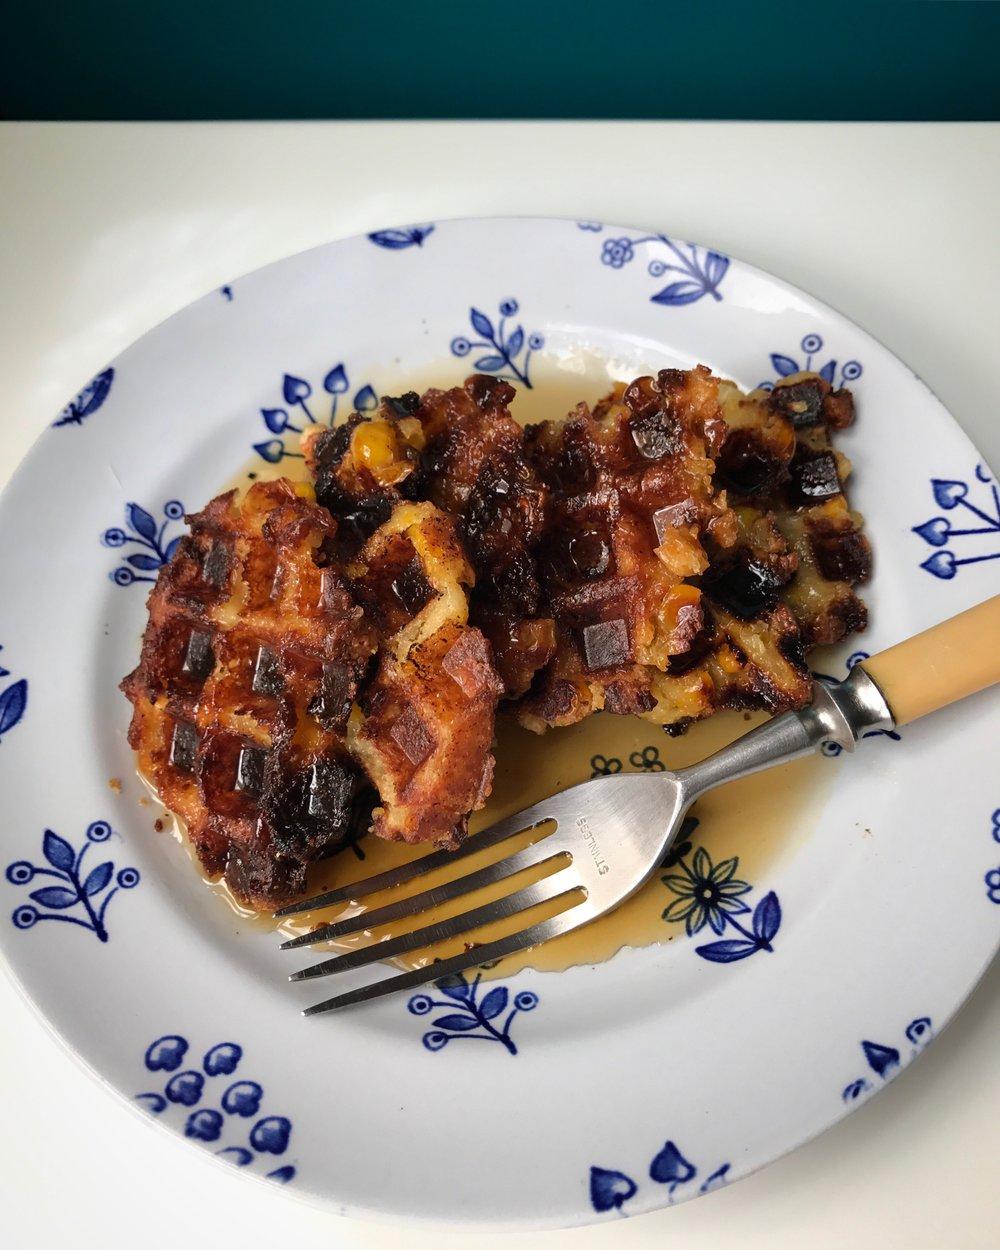 cornbread pudding waffles